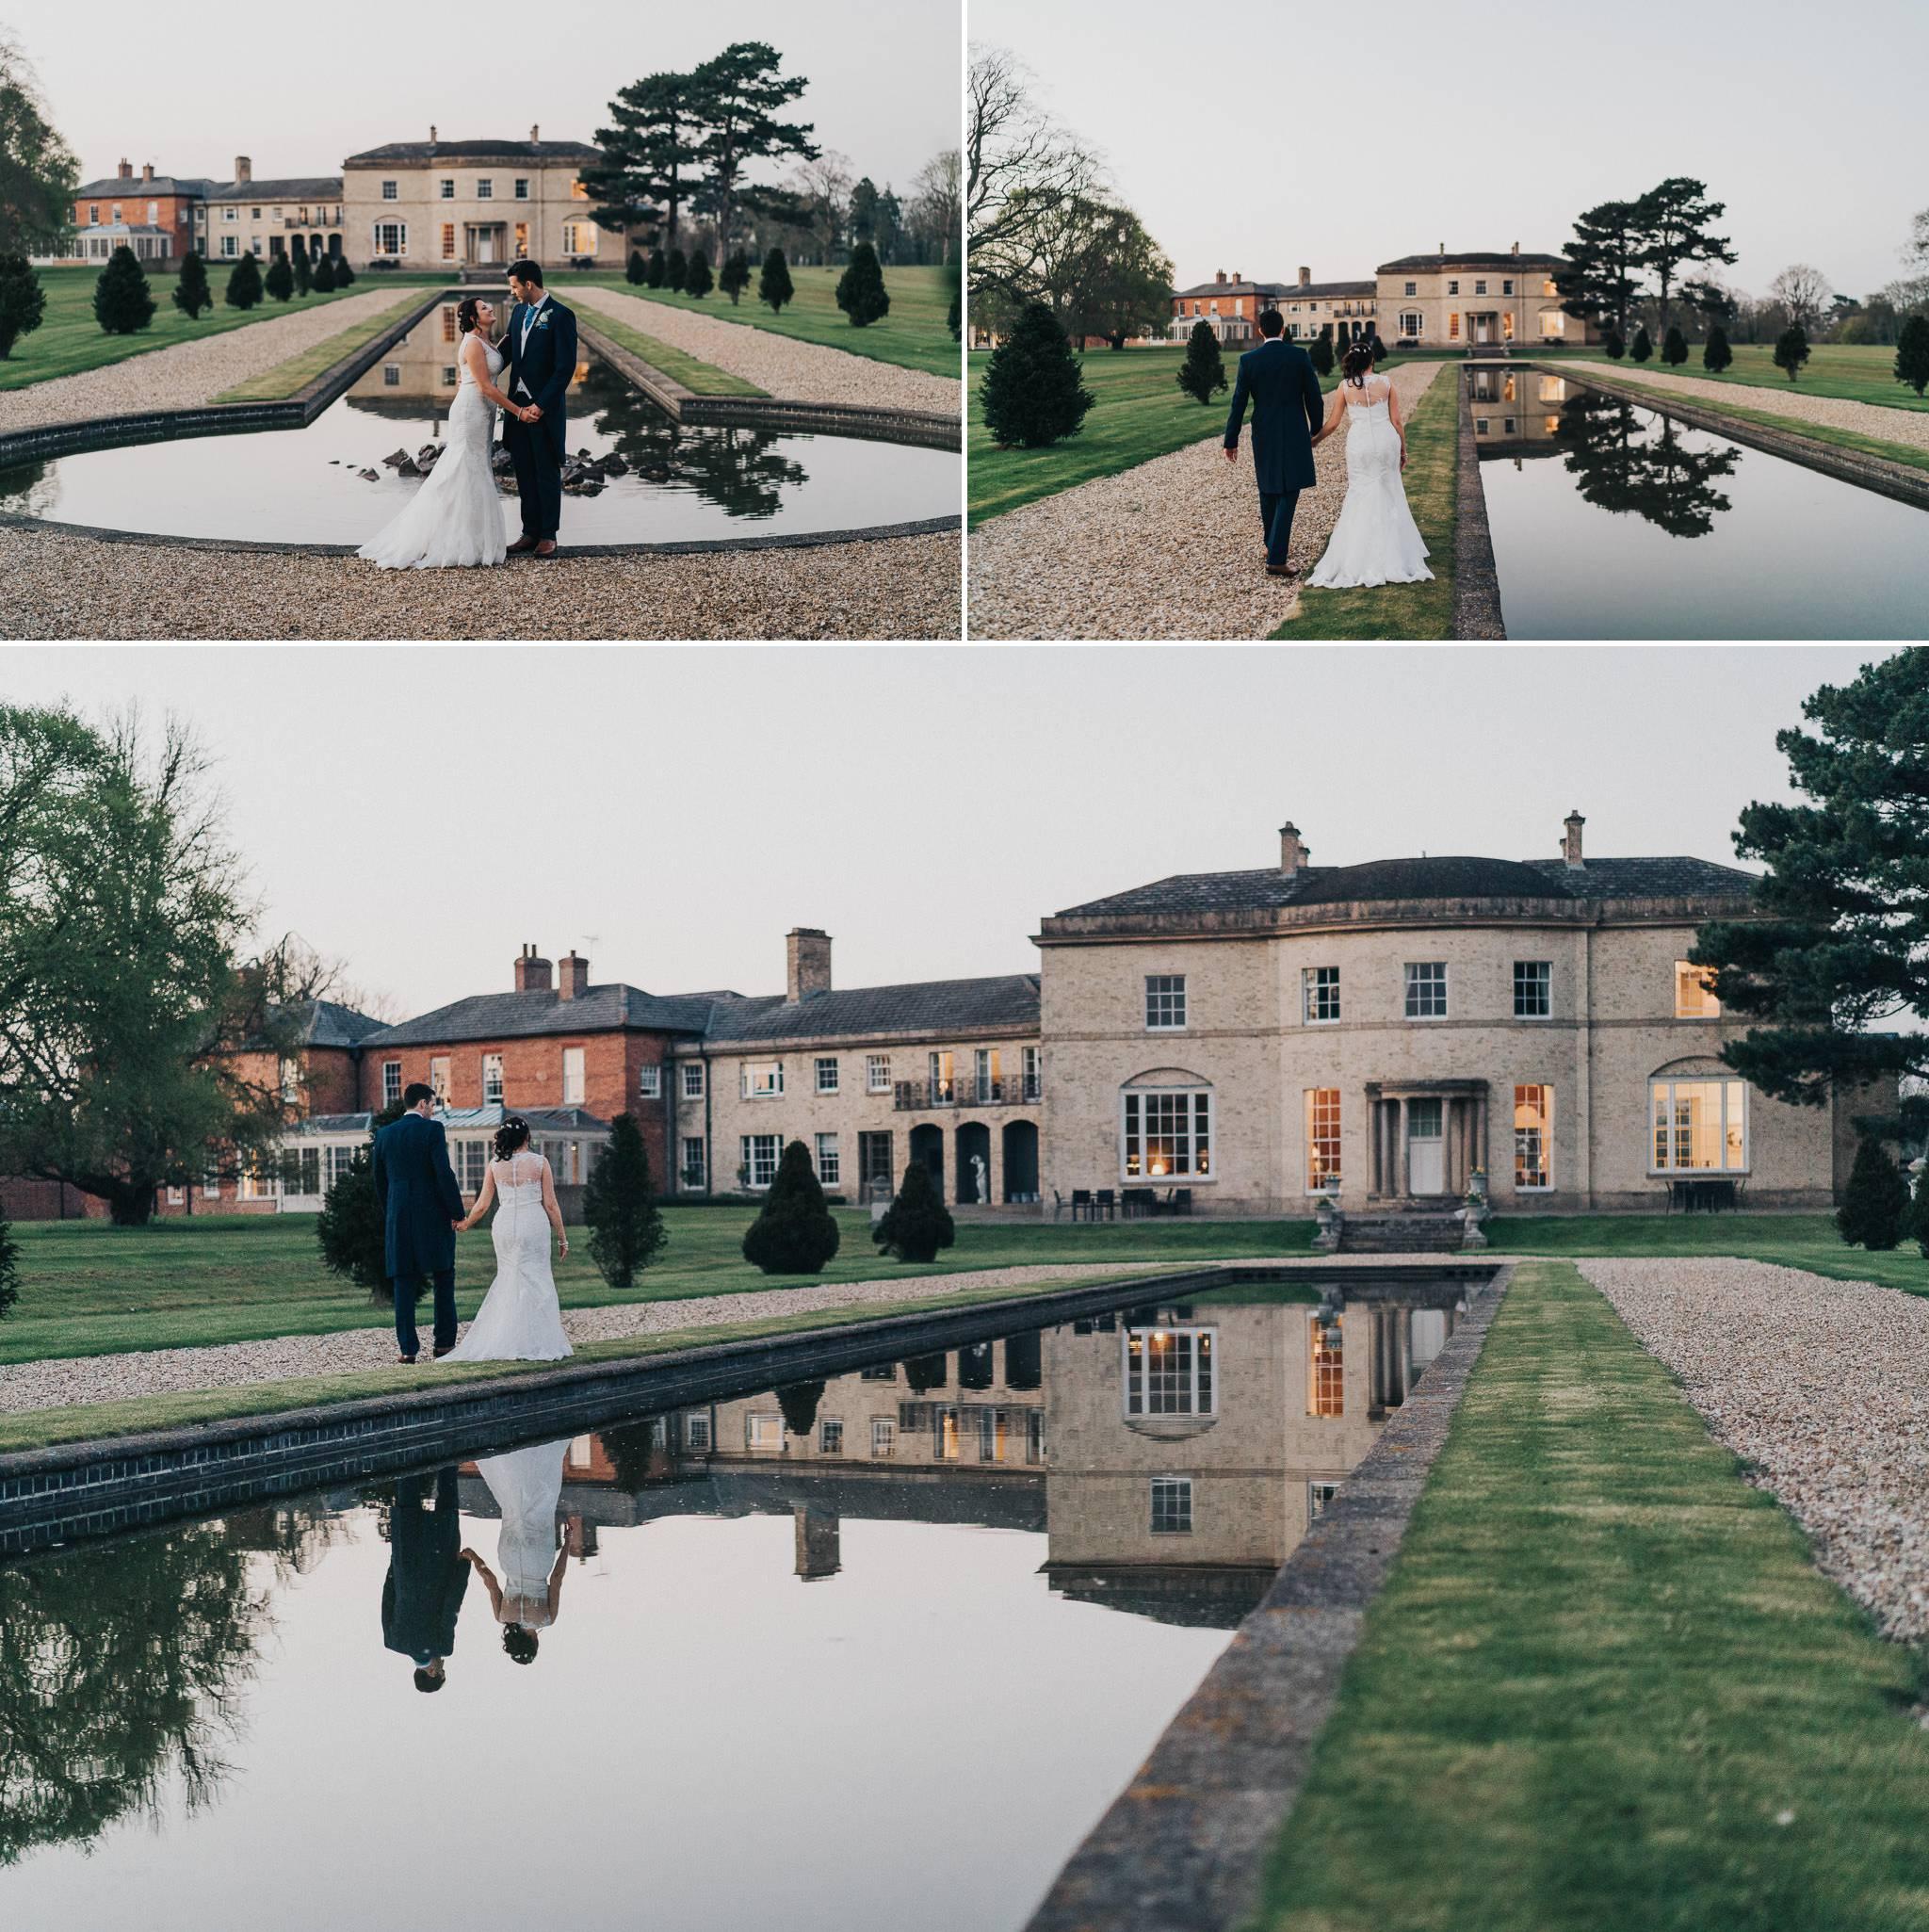 stubton-hall-wedding-photography 22.jpg